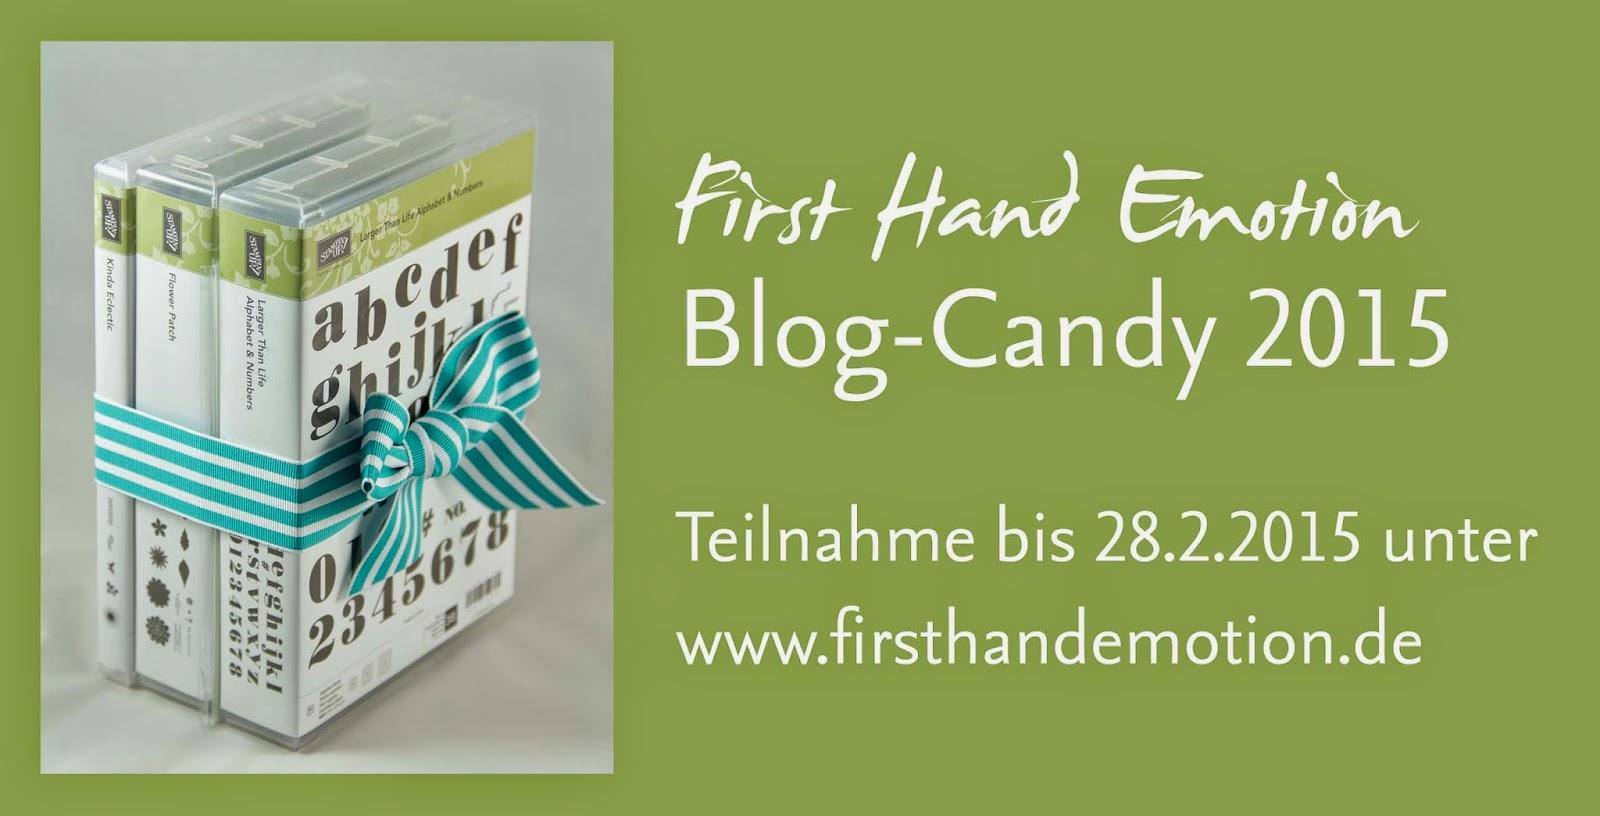 Blog-Candy 2015